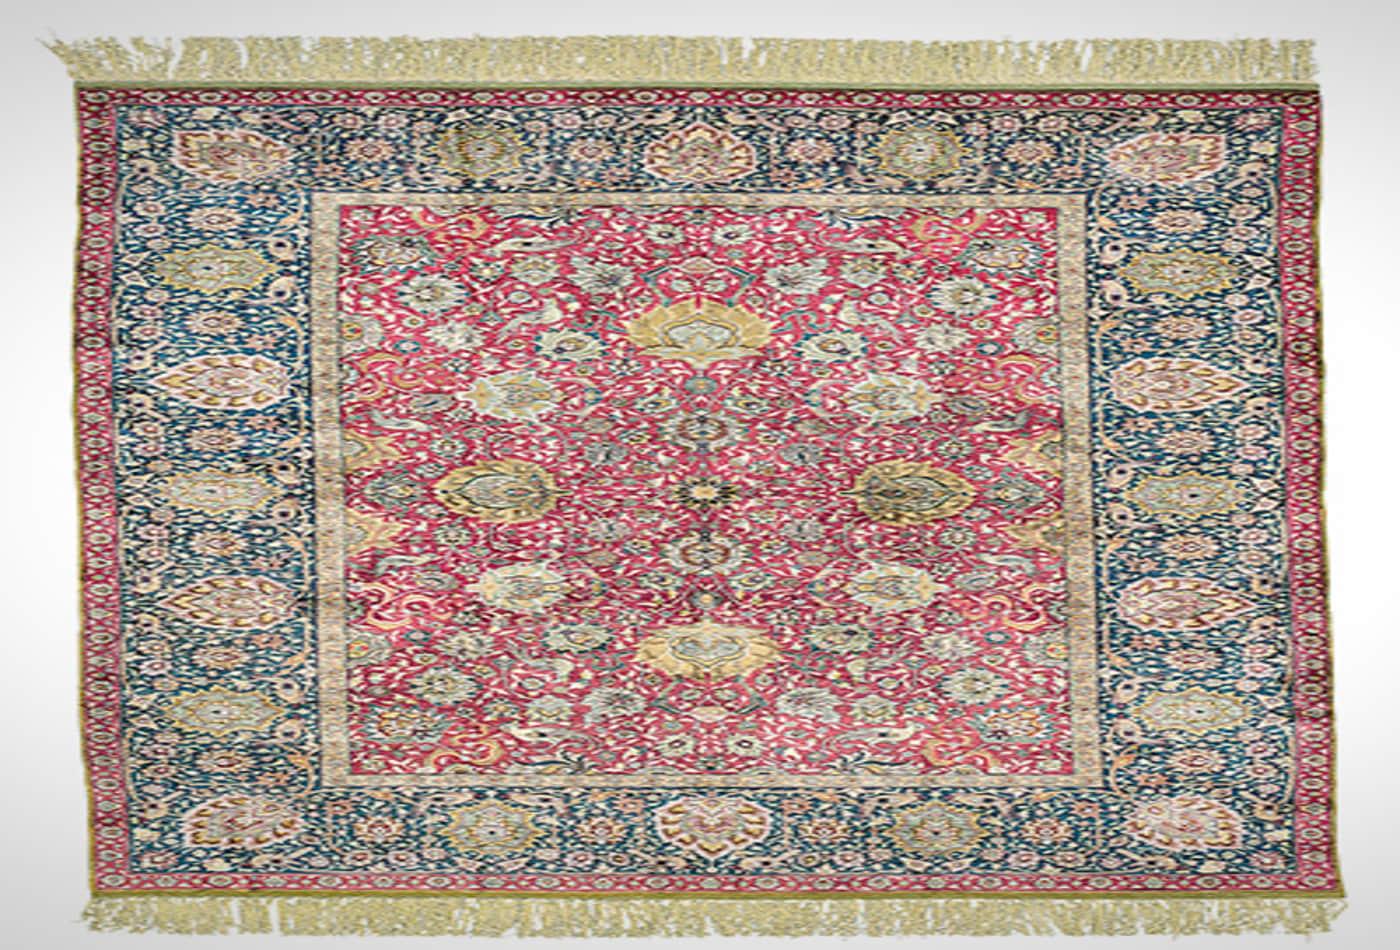 48743547 Investing-in-turkish-treaures-istanbul-carpet.jpg